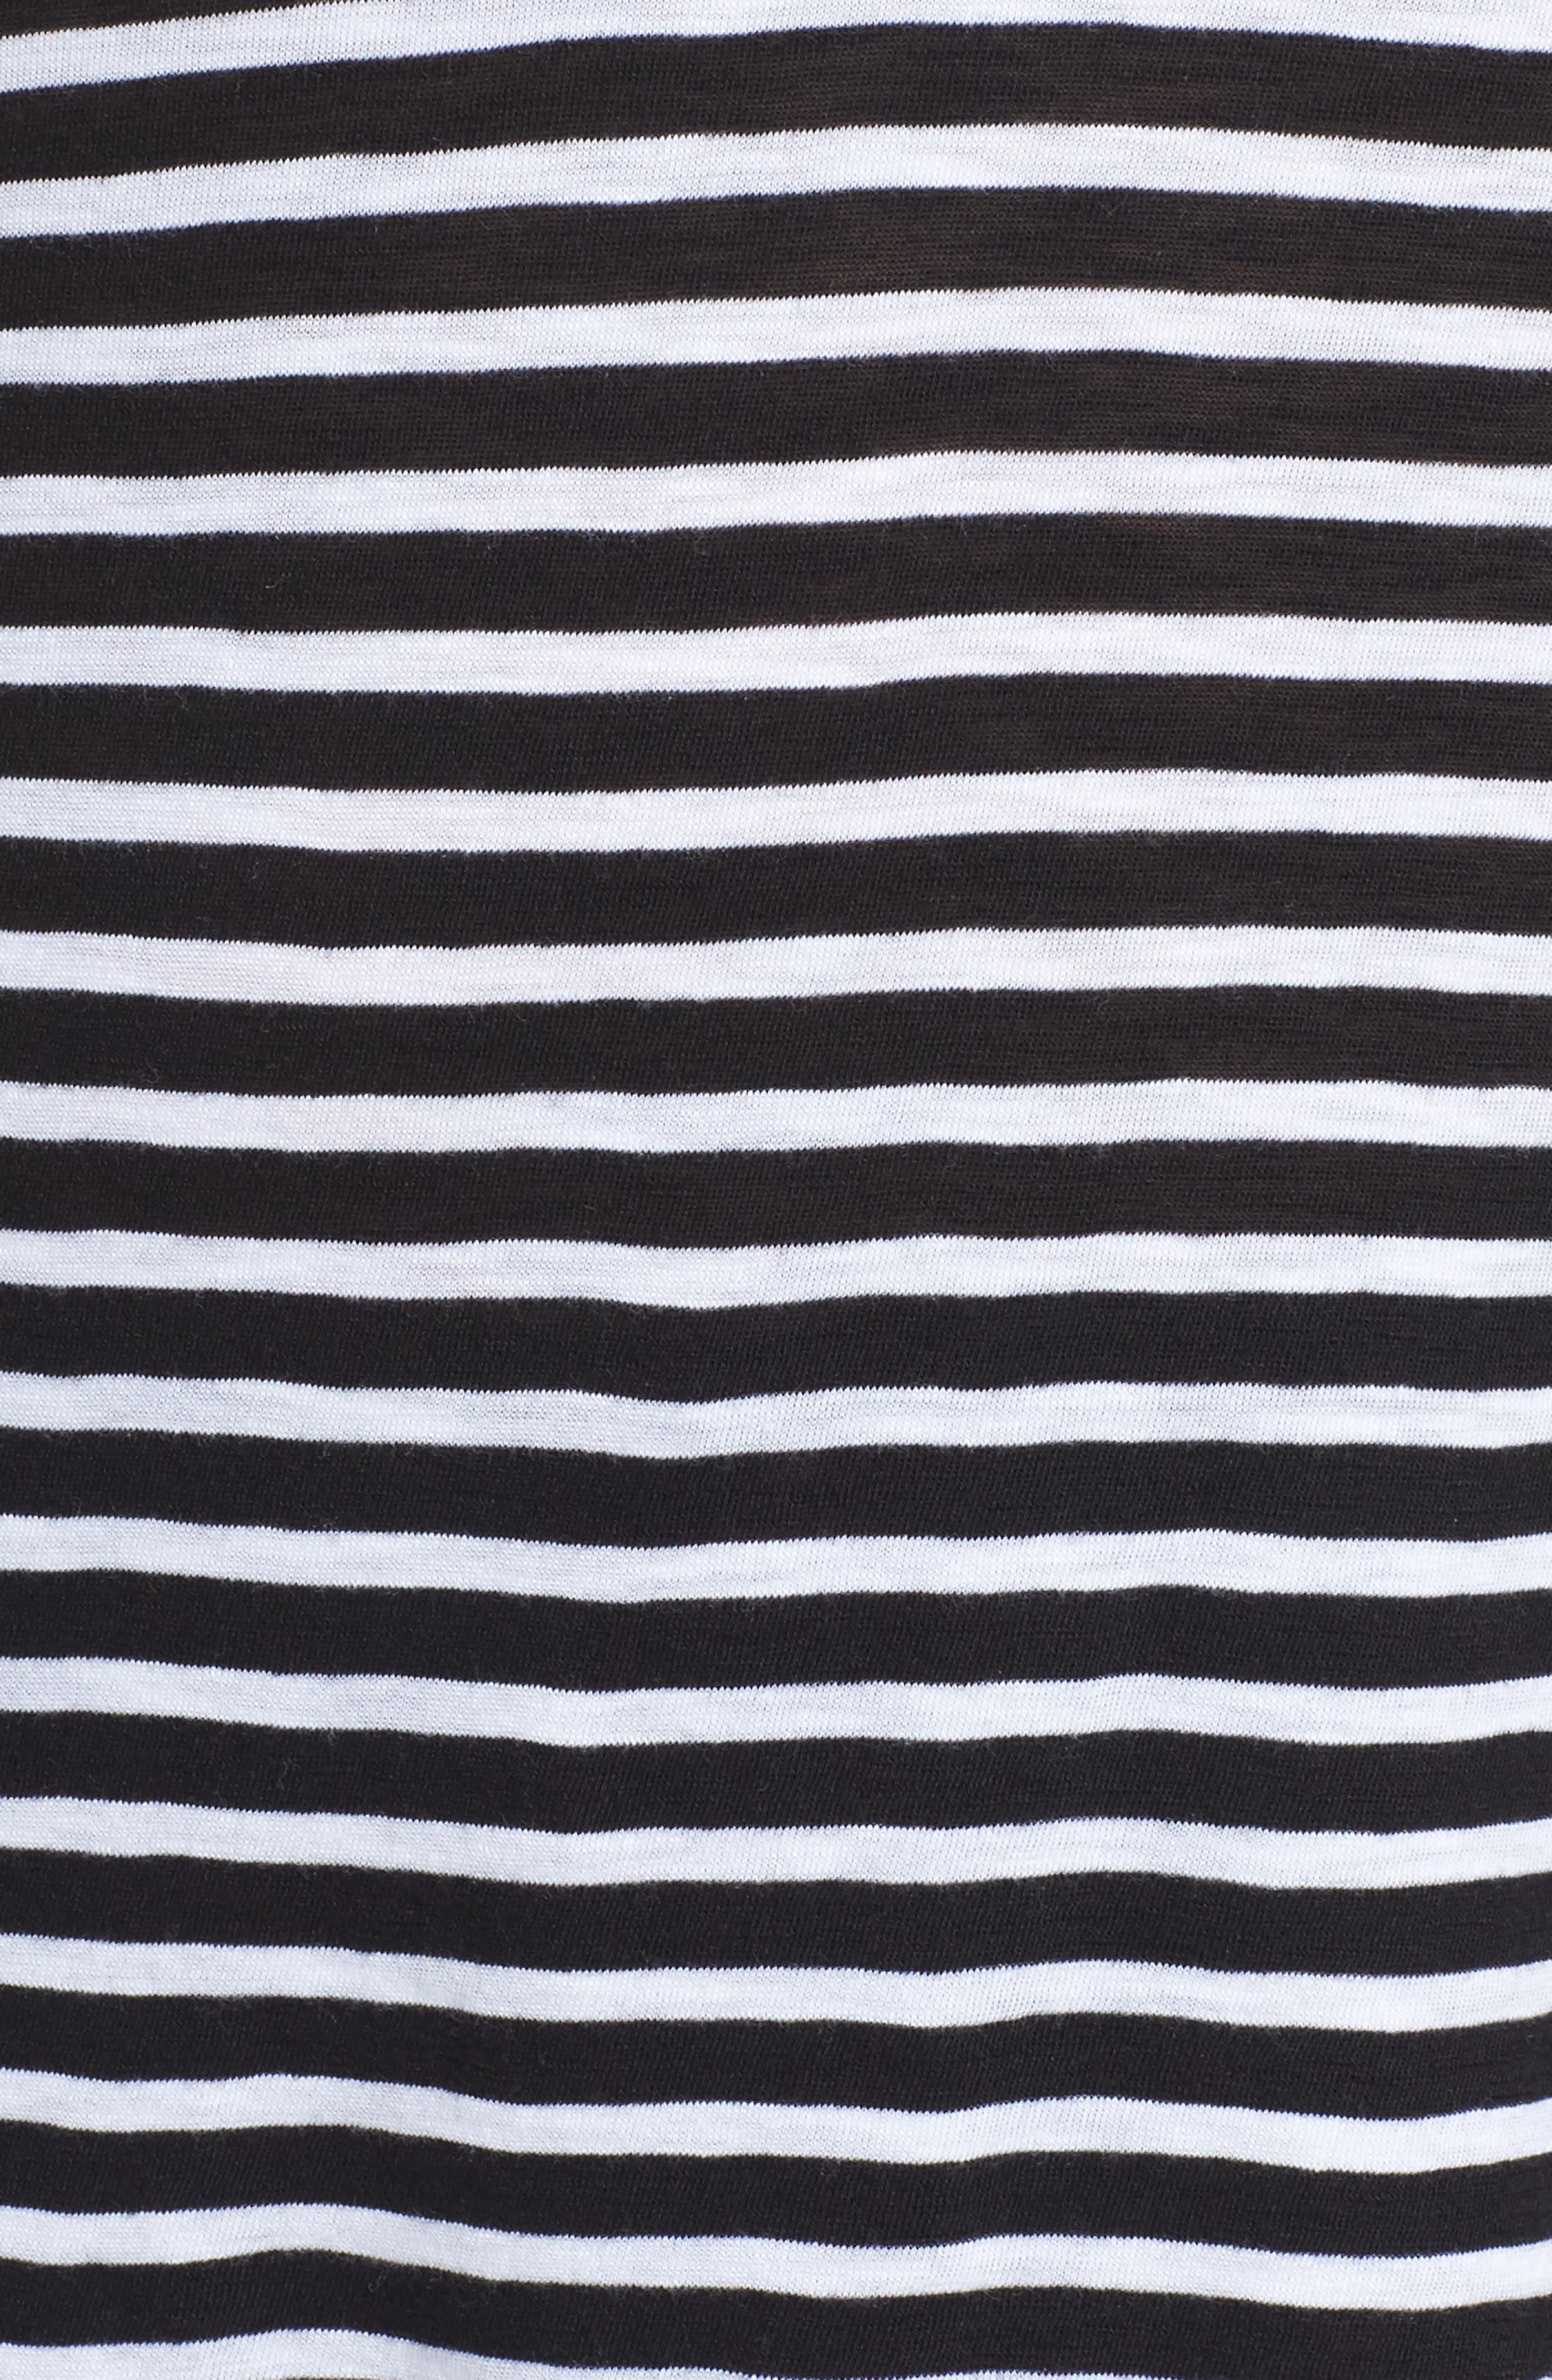 Long Sleeve Crewneck Tee,                             Alternate thumbnail 32, color,                             Black- White Maisie Stripe